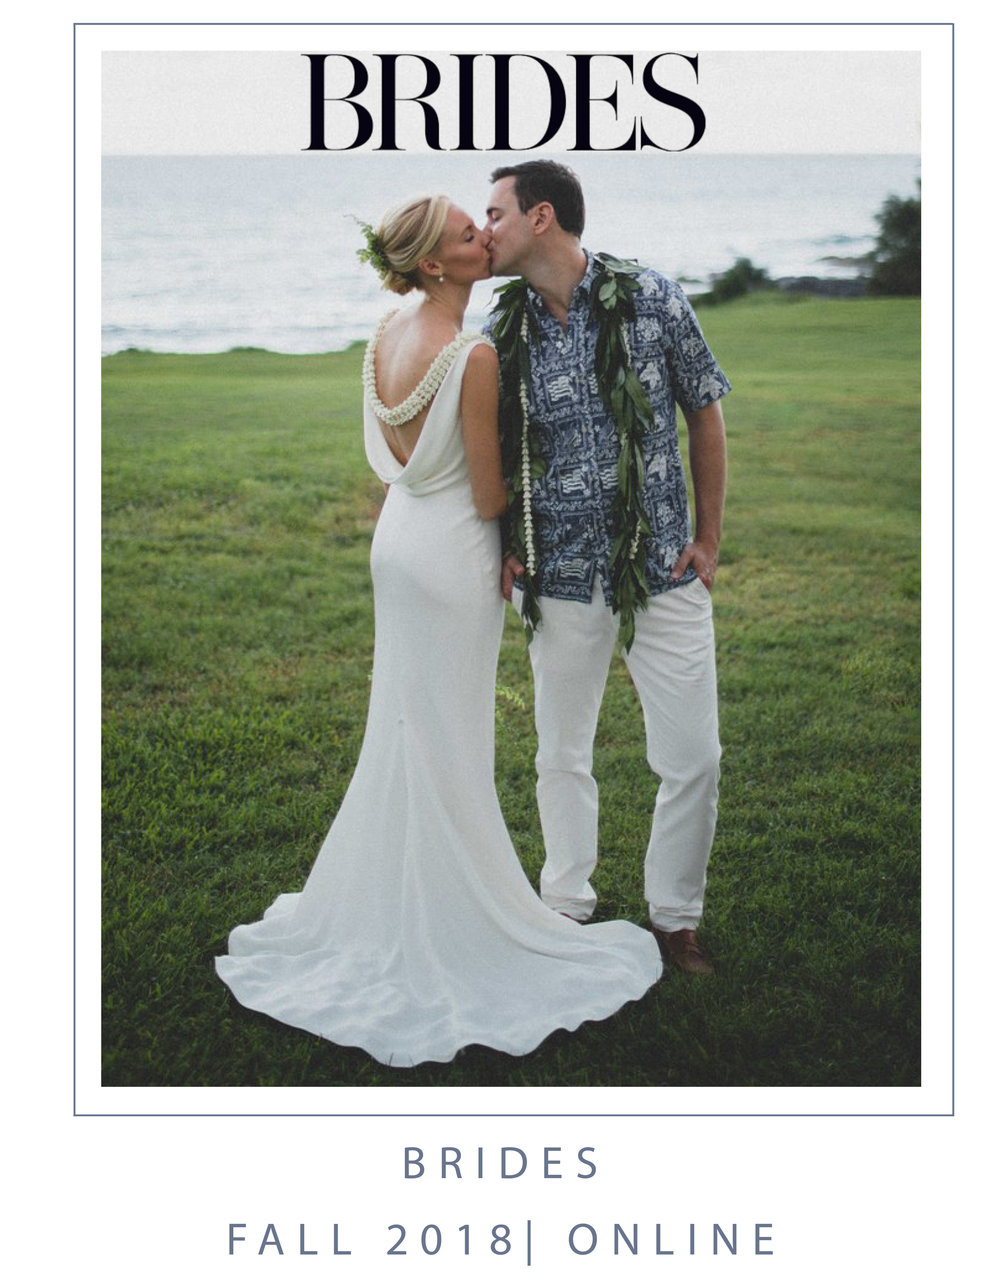 brides_press.jpg